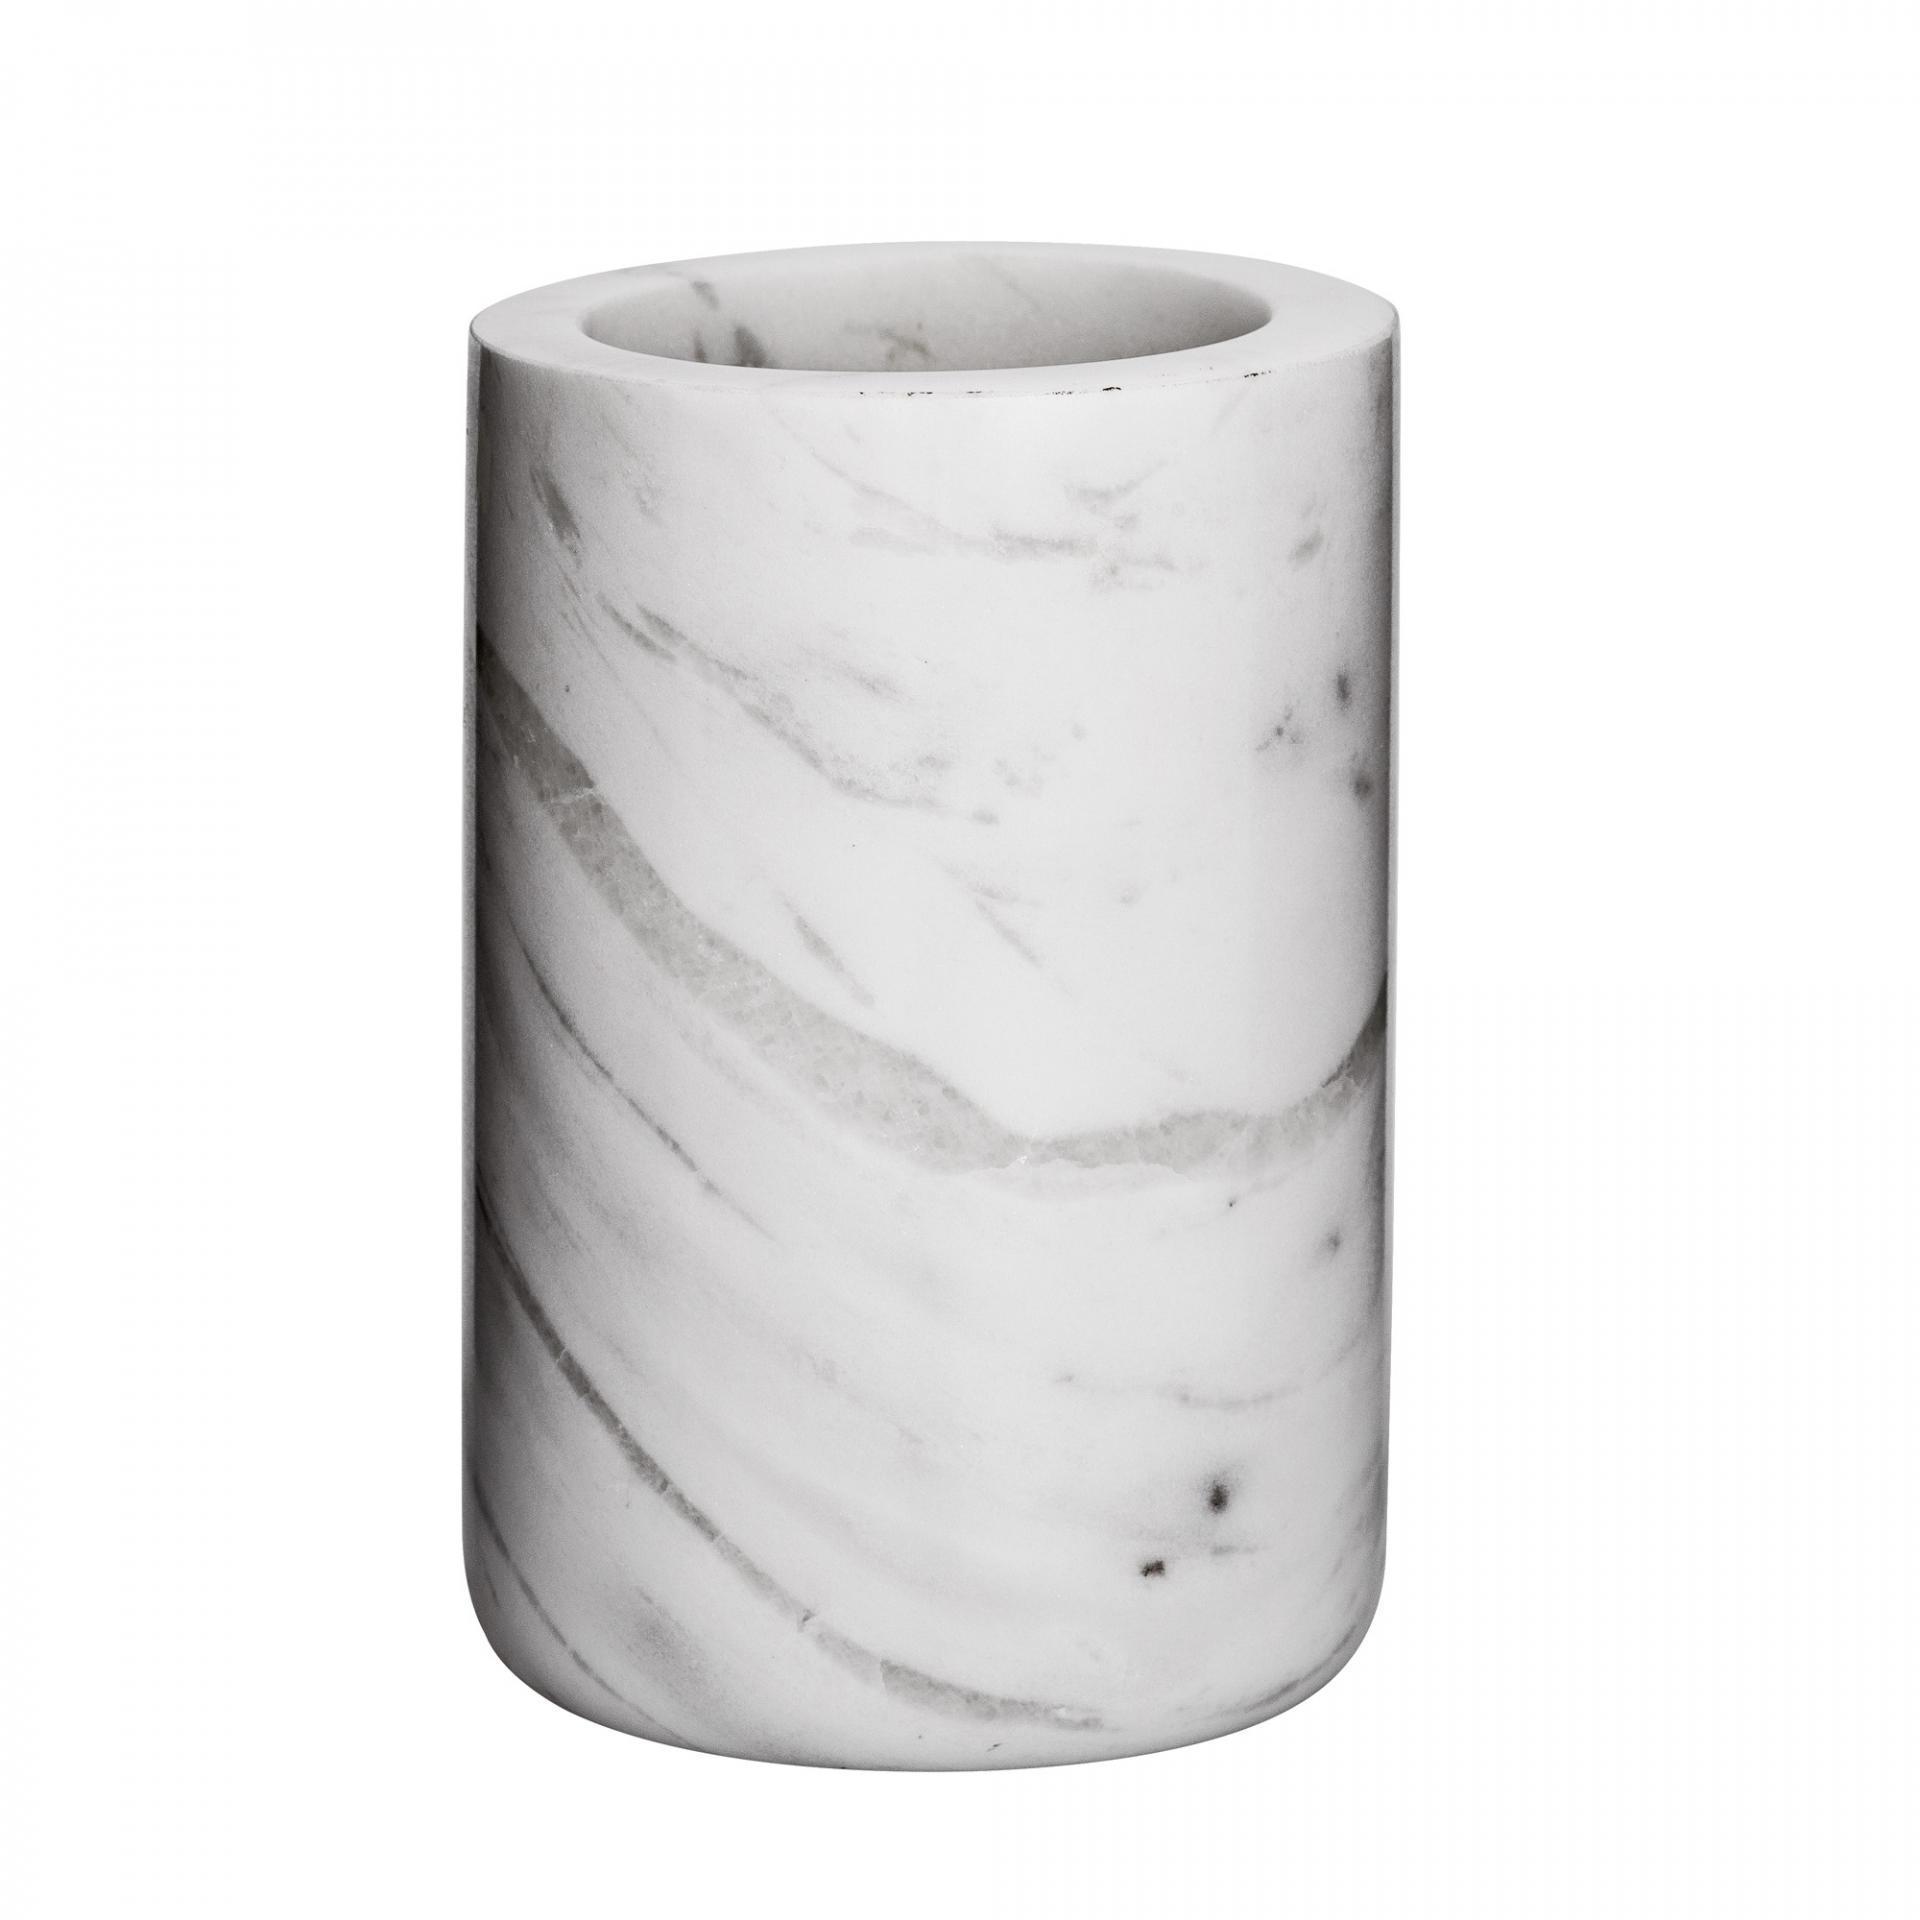 Bloomingville Mramorový kalíšek do koupelny White Marble, šedá barva, mramor